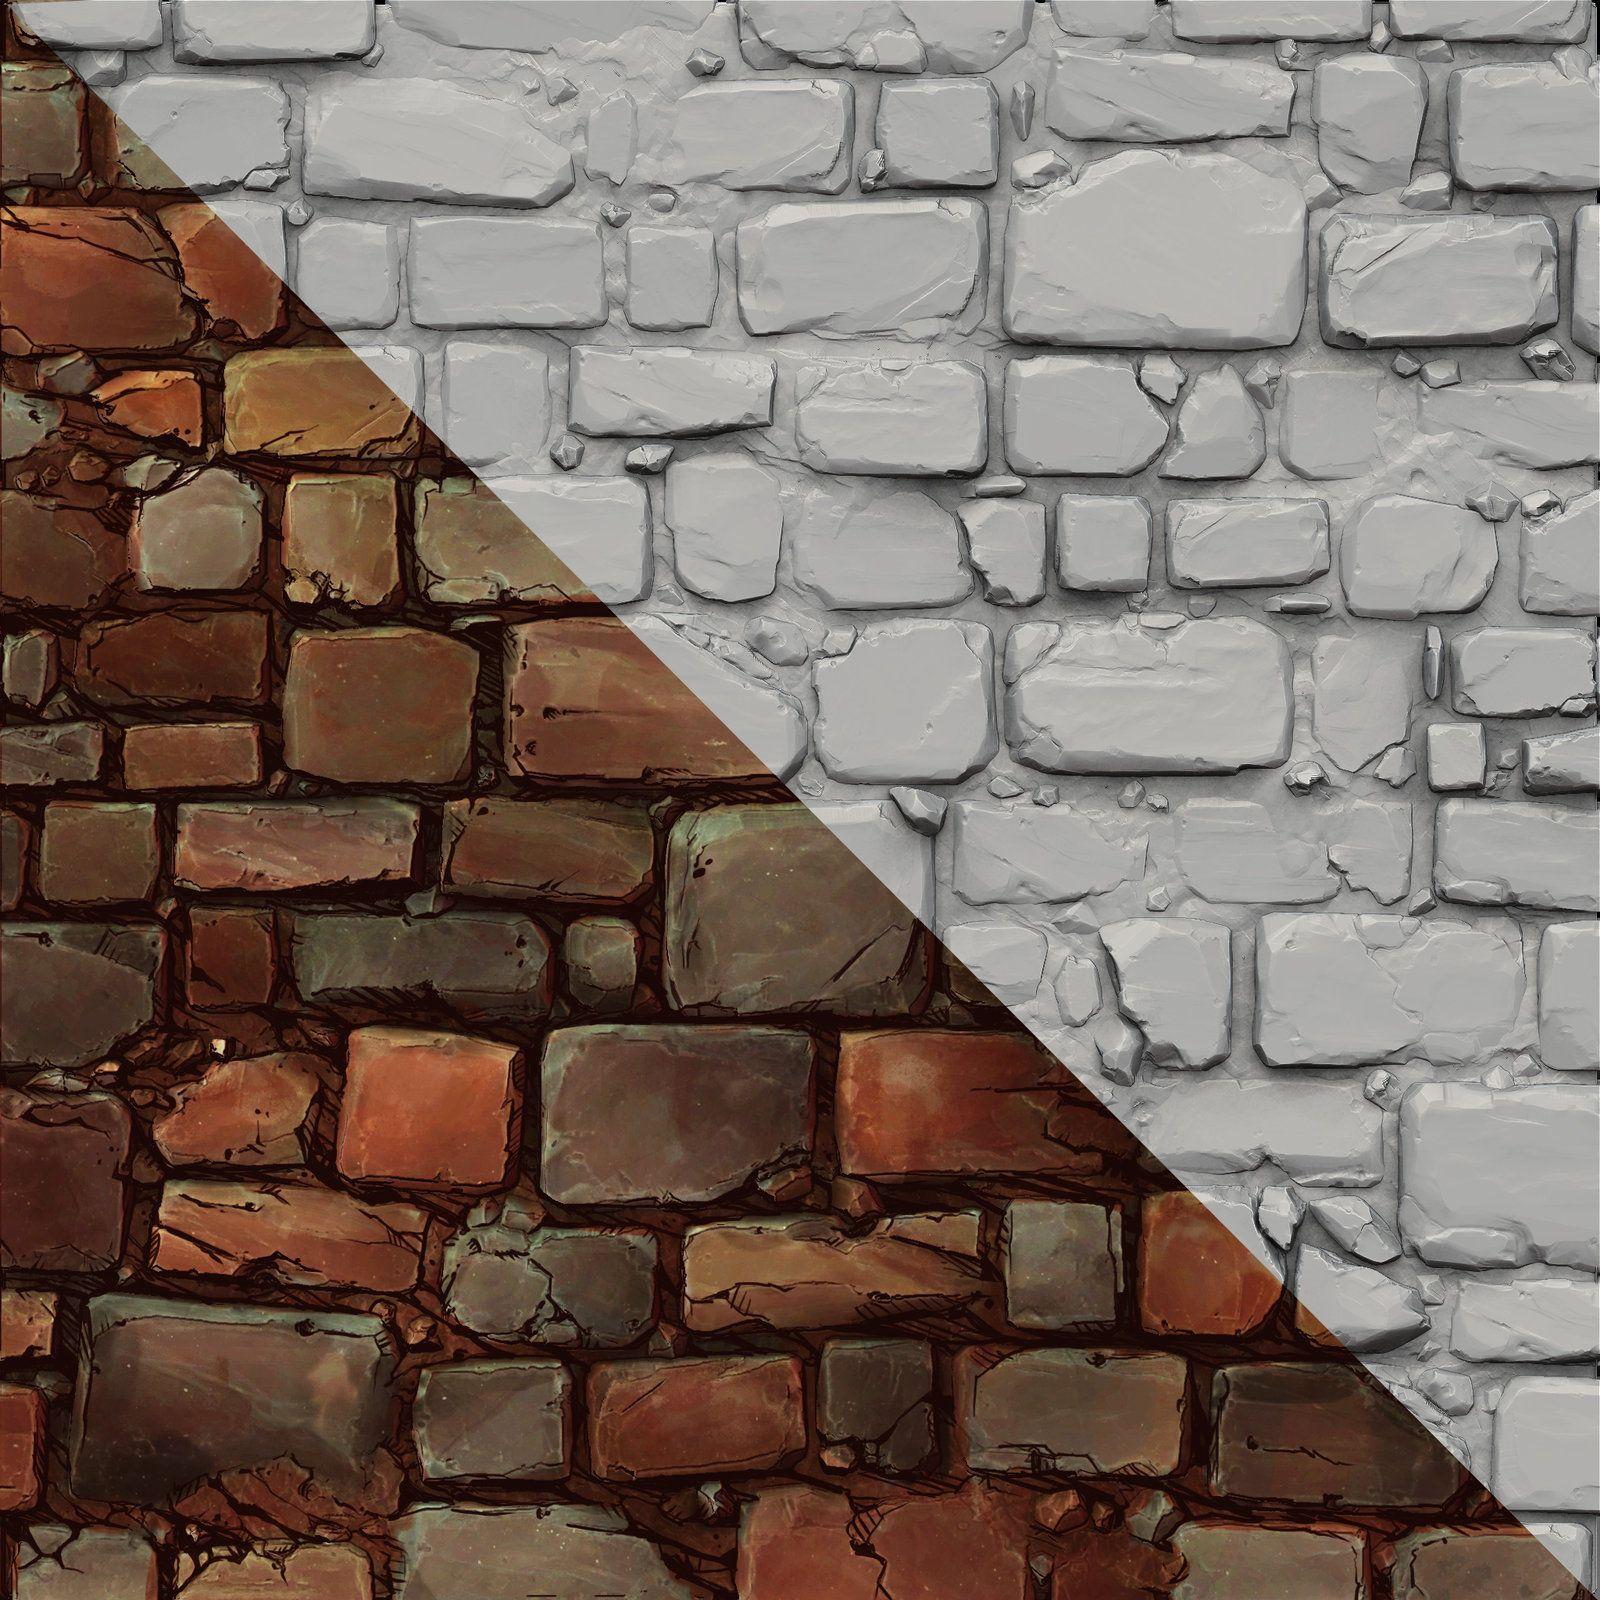 Brick Wall Sculpt And Comic Style Texture, Jesse Carpenter